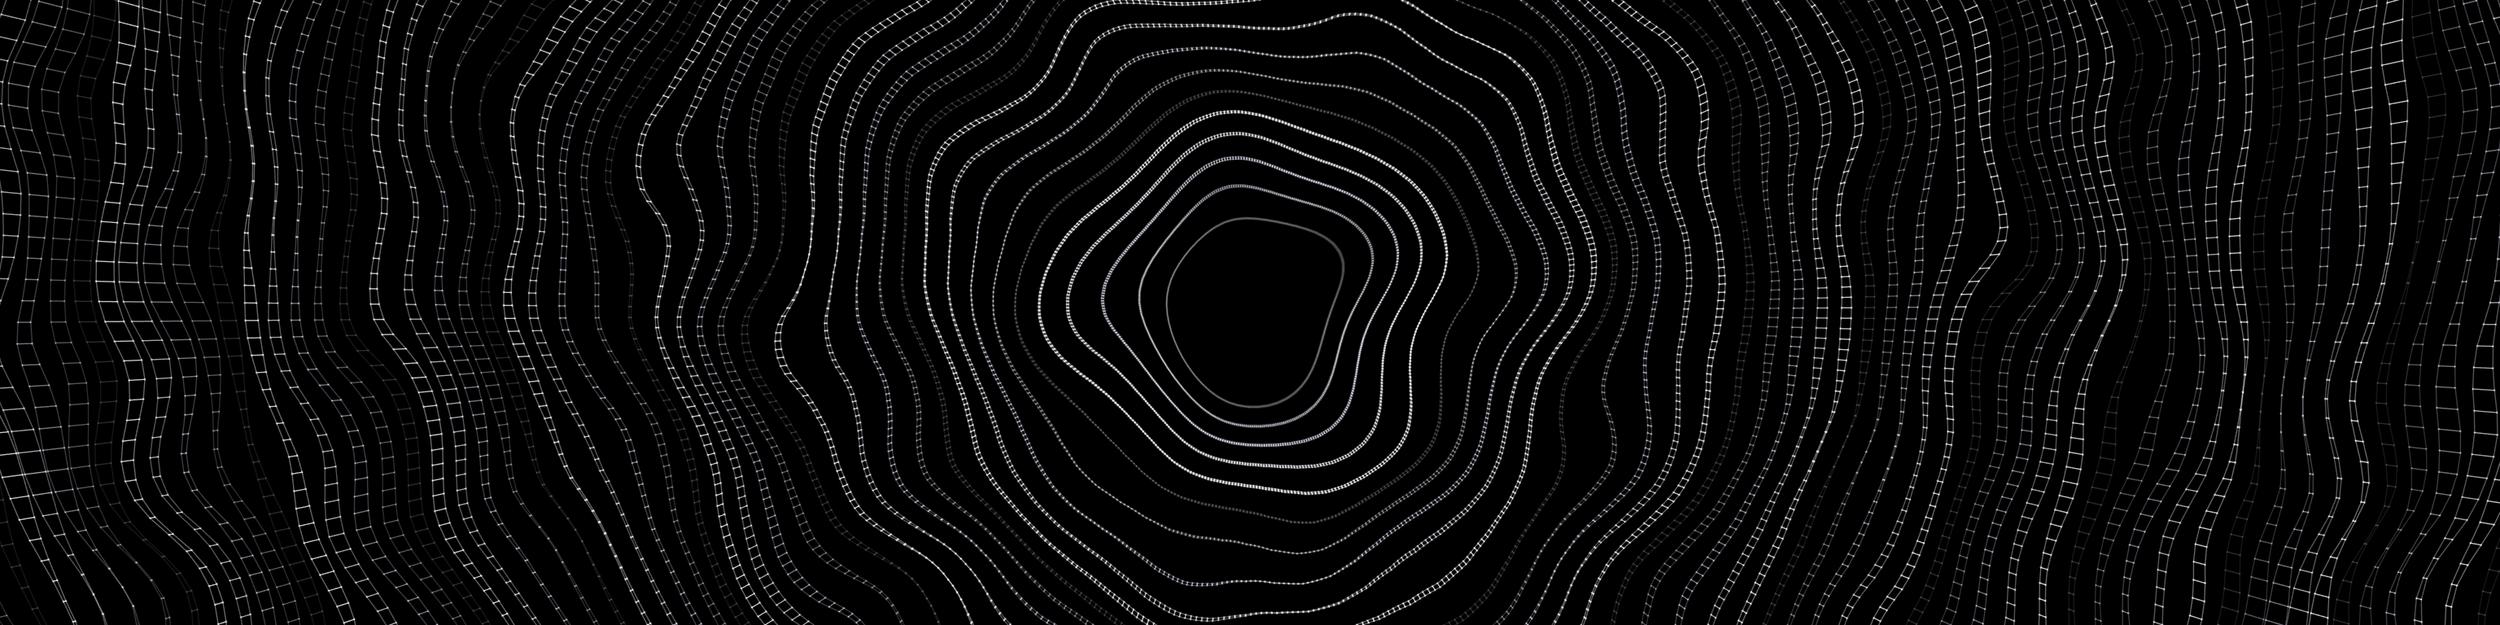 NoiseFormLayer 2014-09-11-17-02-49-209.png